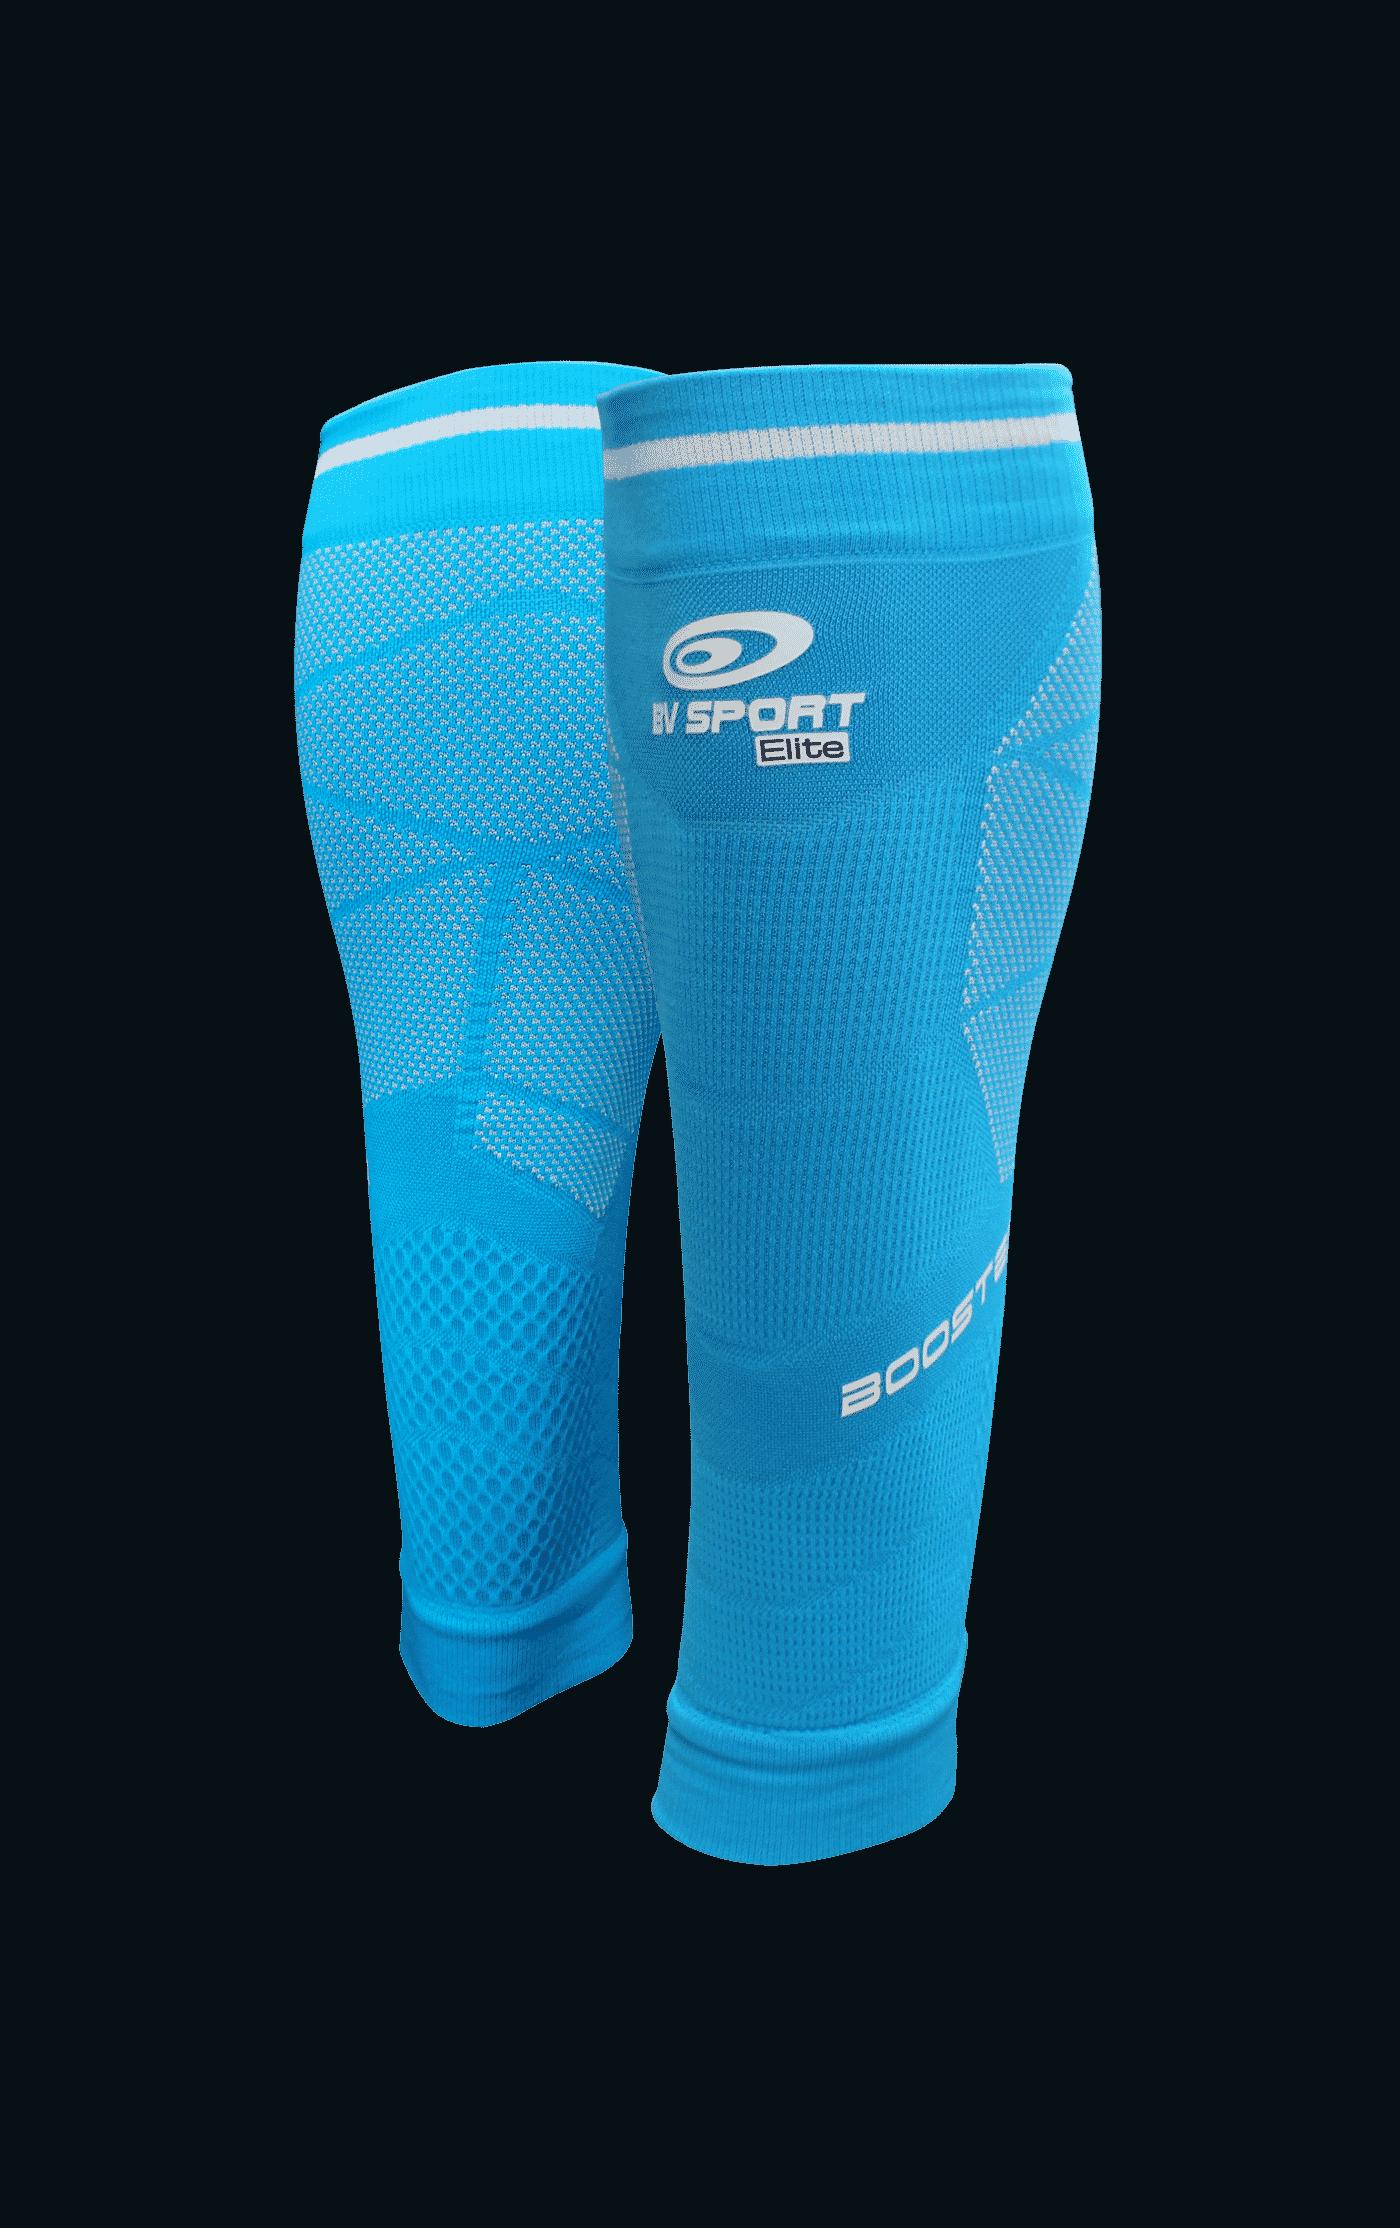 bv-sport-booster-elite-evo2-bleu-fluo